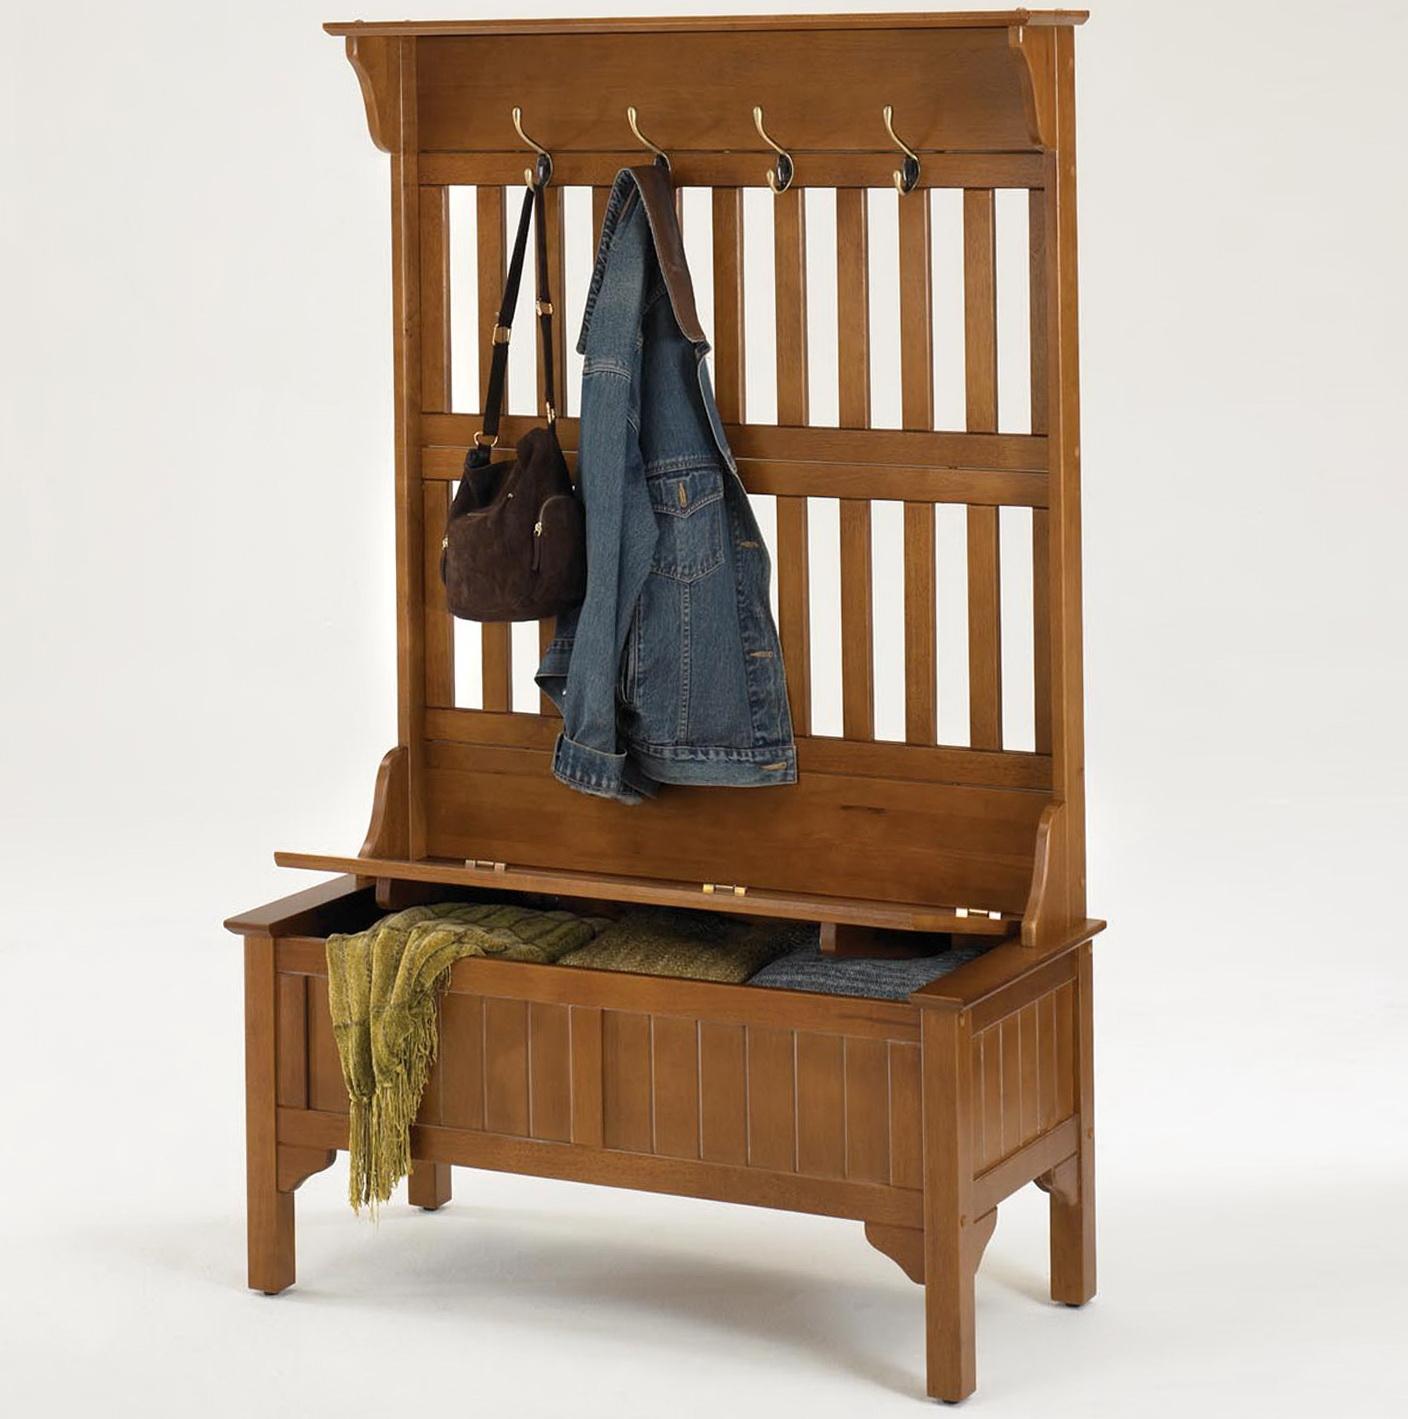 Storage Bench With Coat Rack Plans